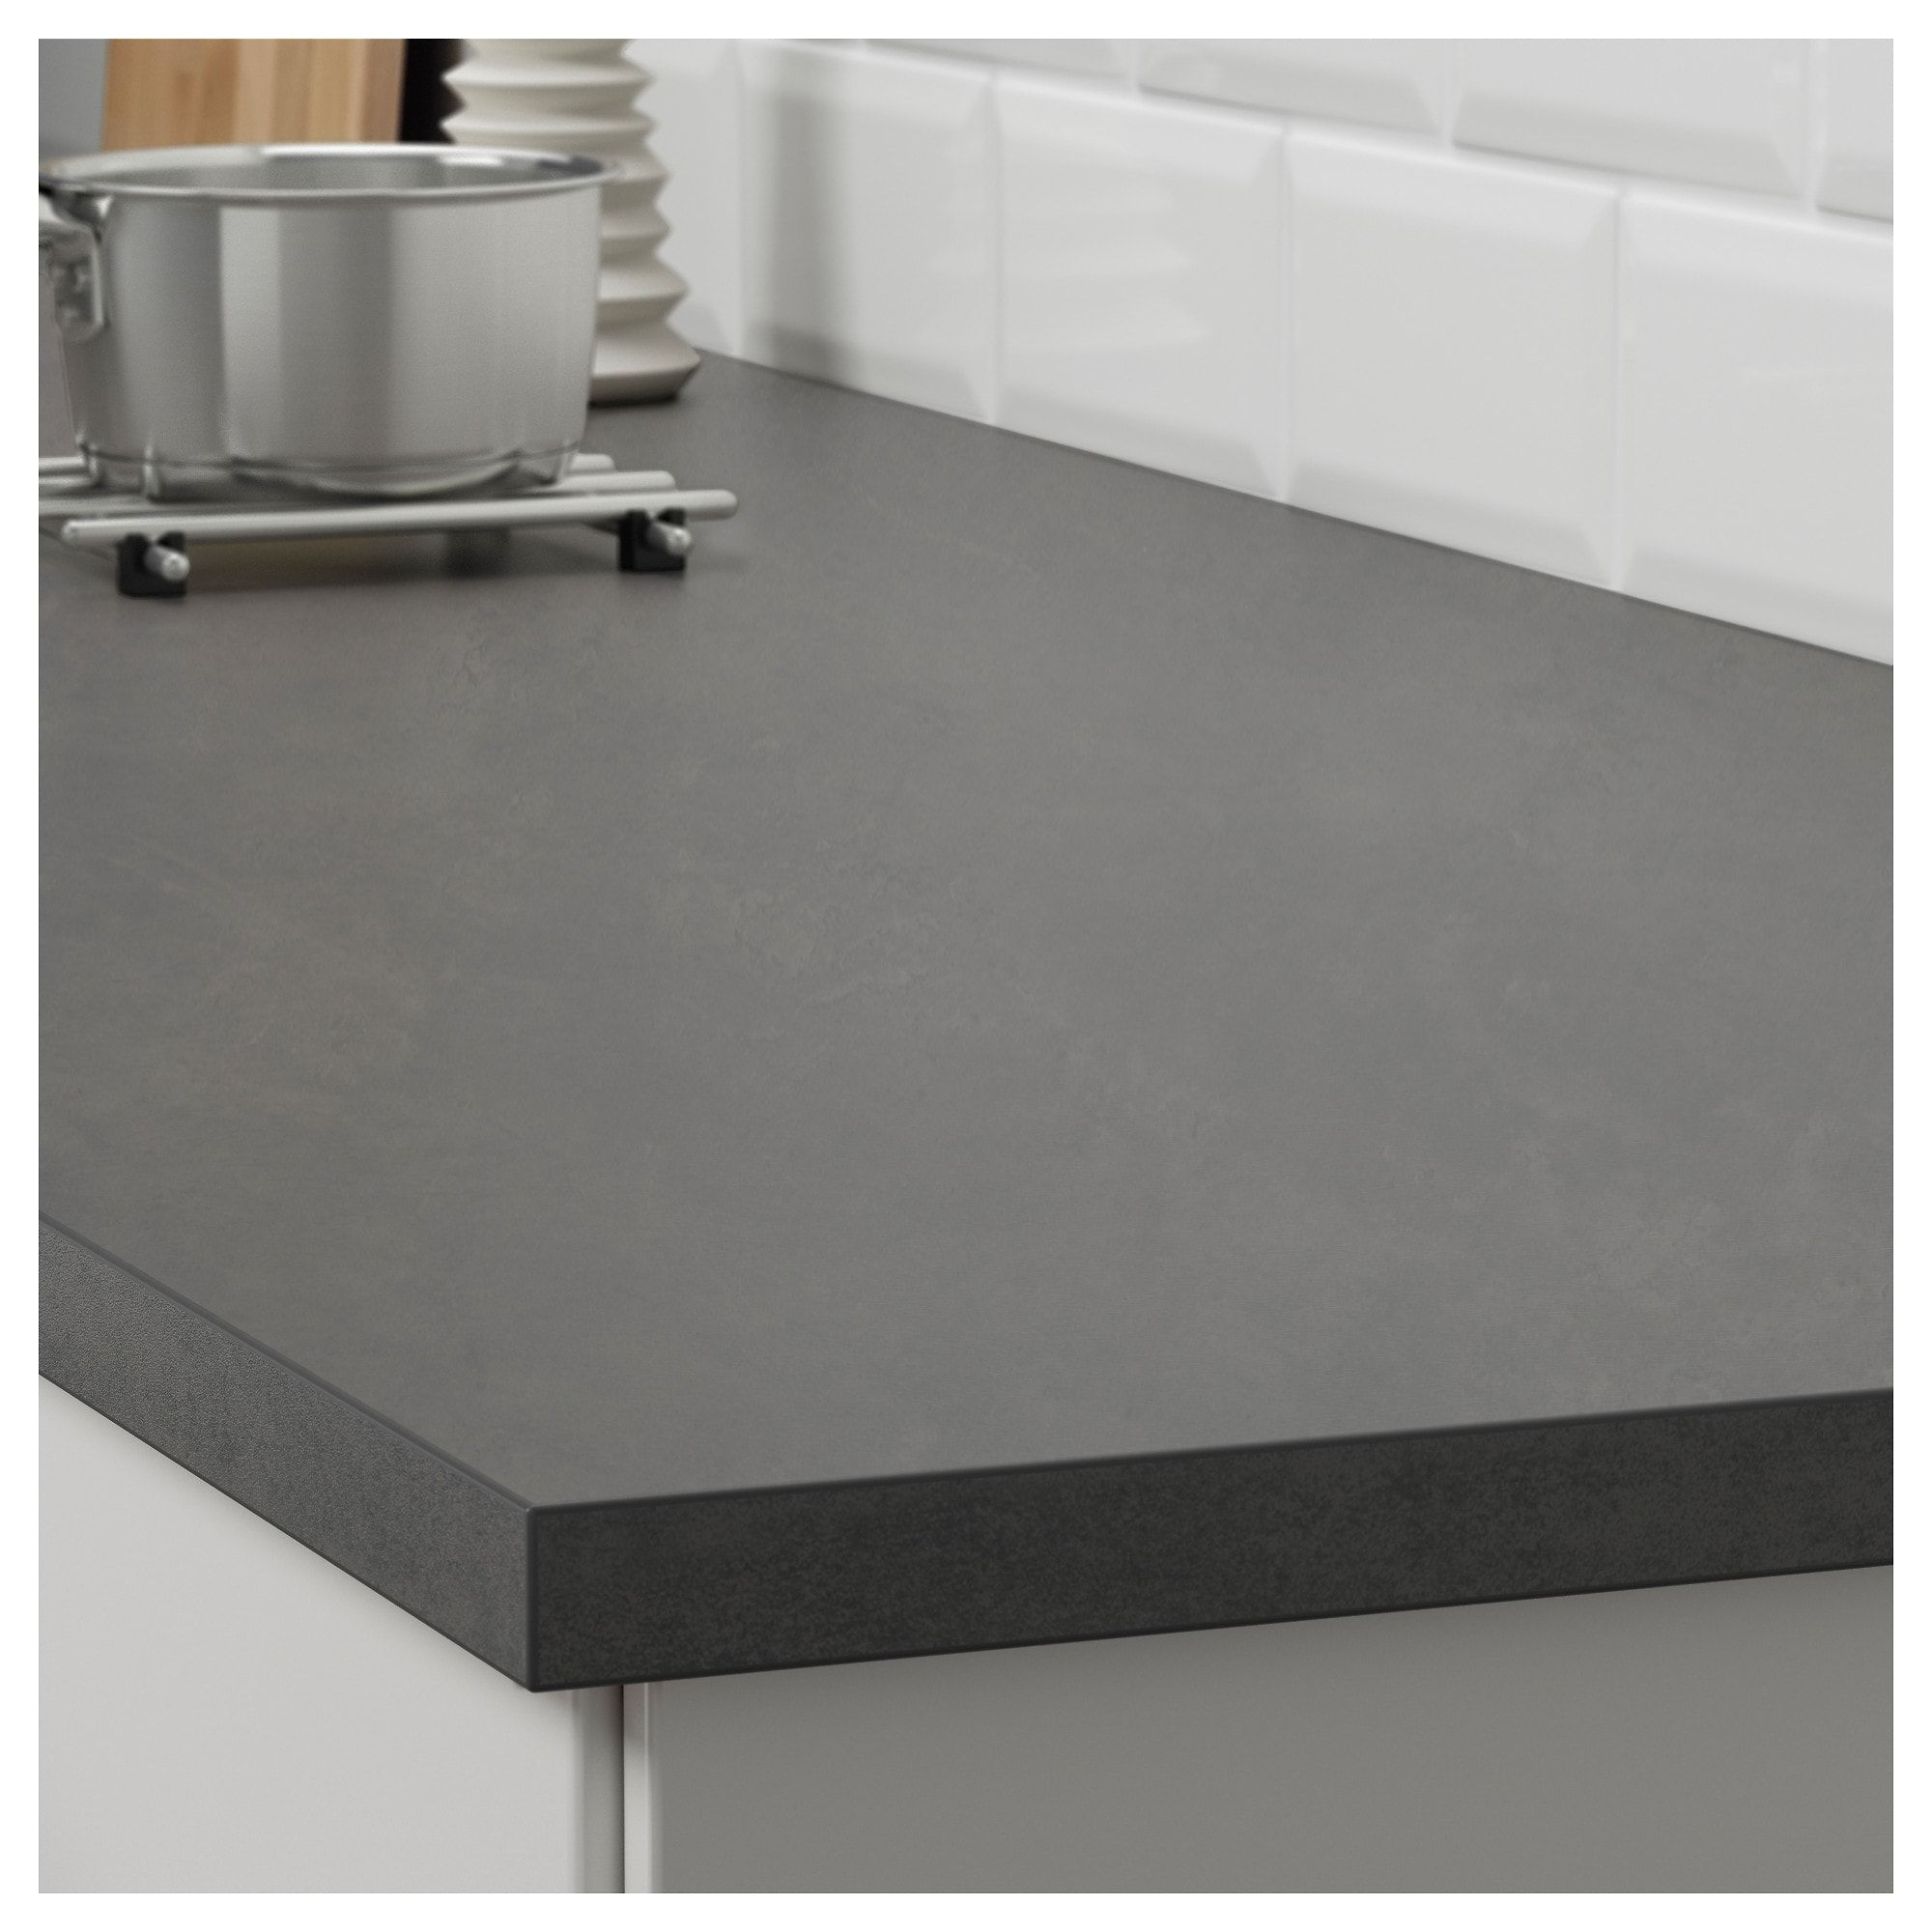 Countertop Concrete Effect Laminate 74x1 1 8 Laminate